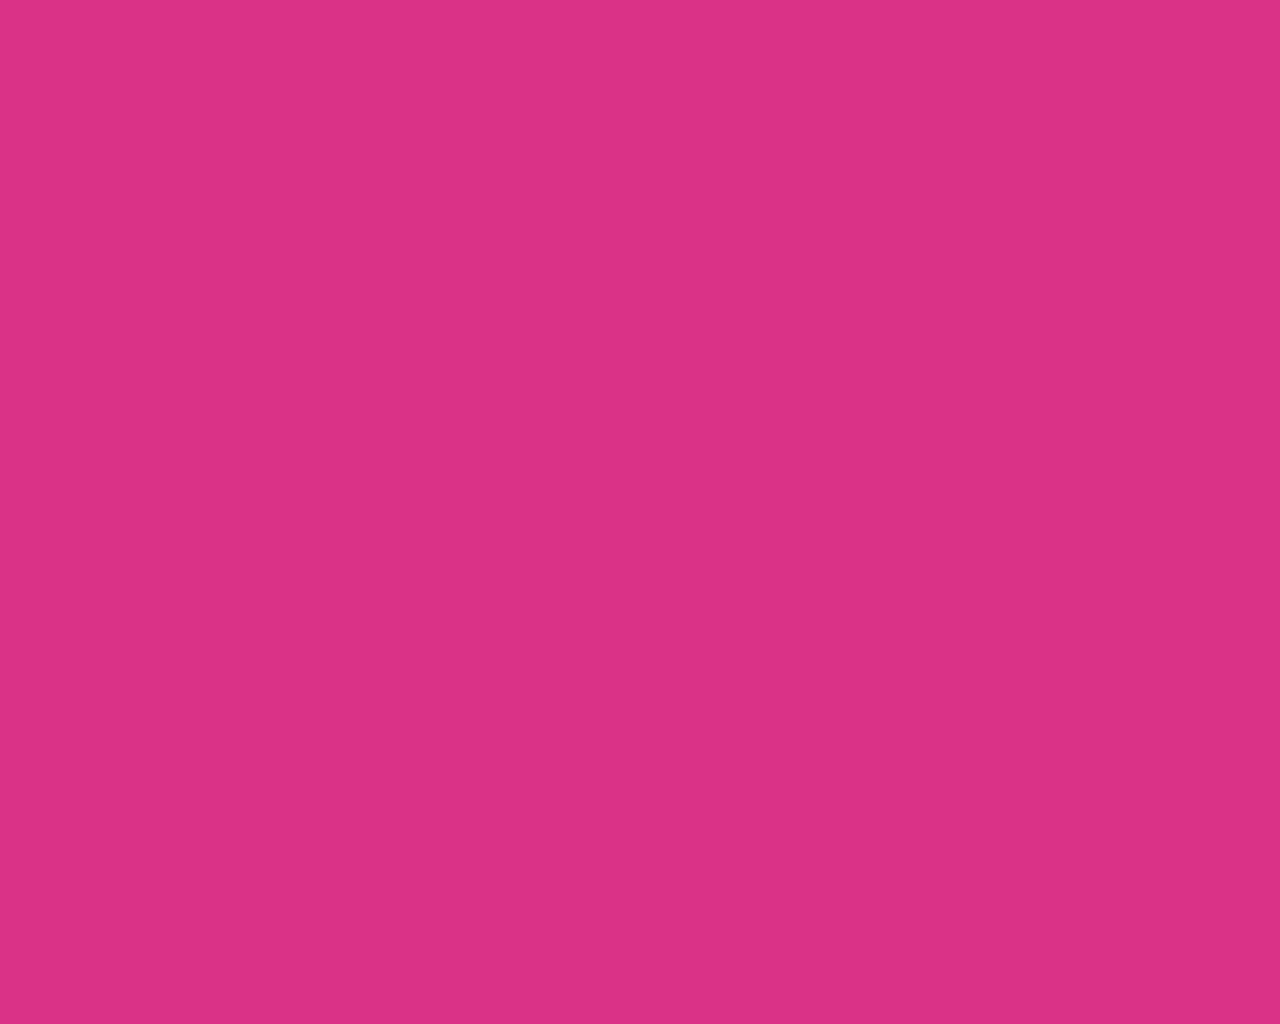 1280x1024 Deep Cerise Solid Color Background